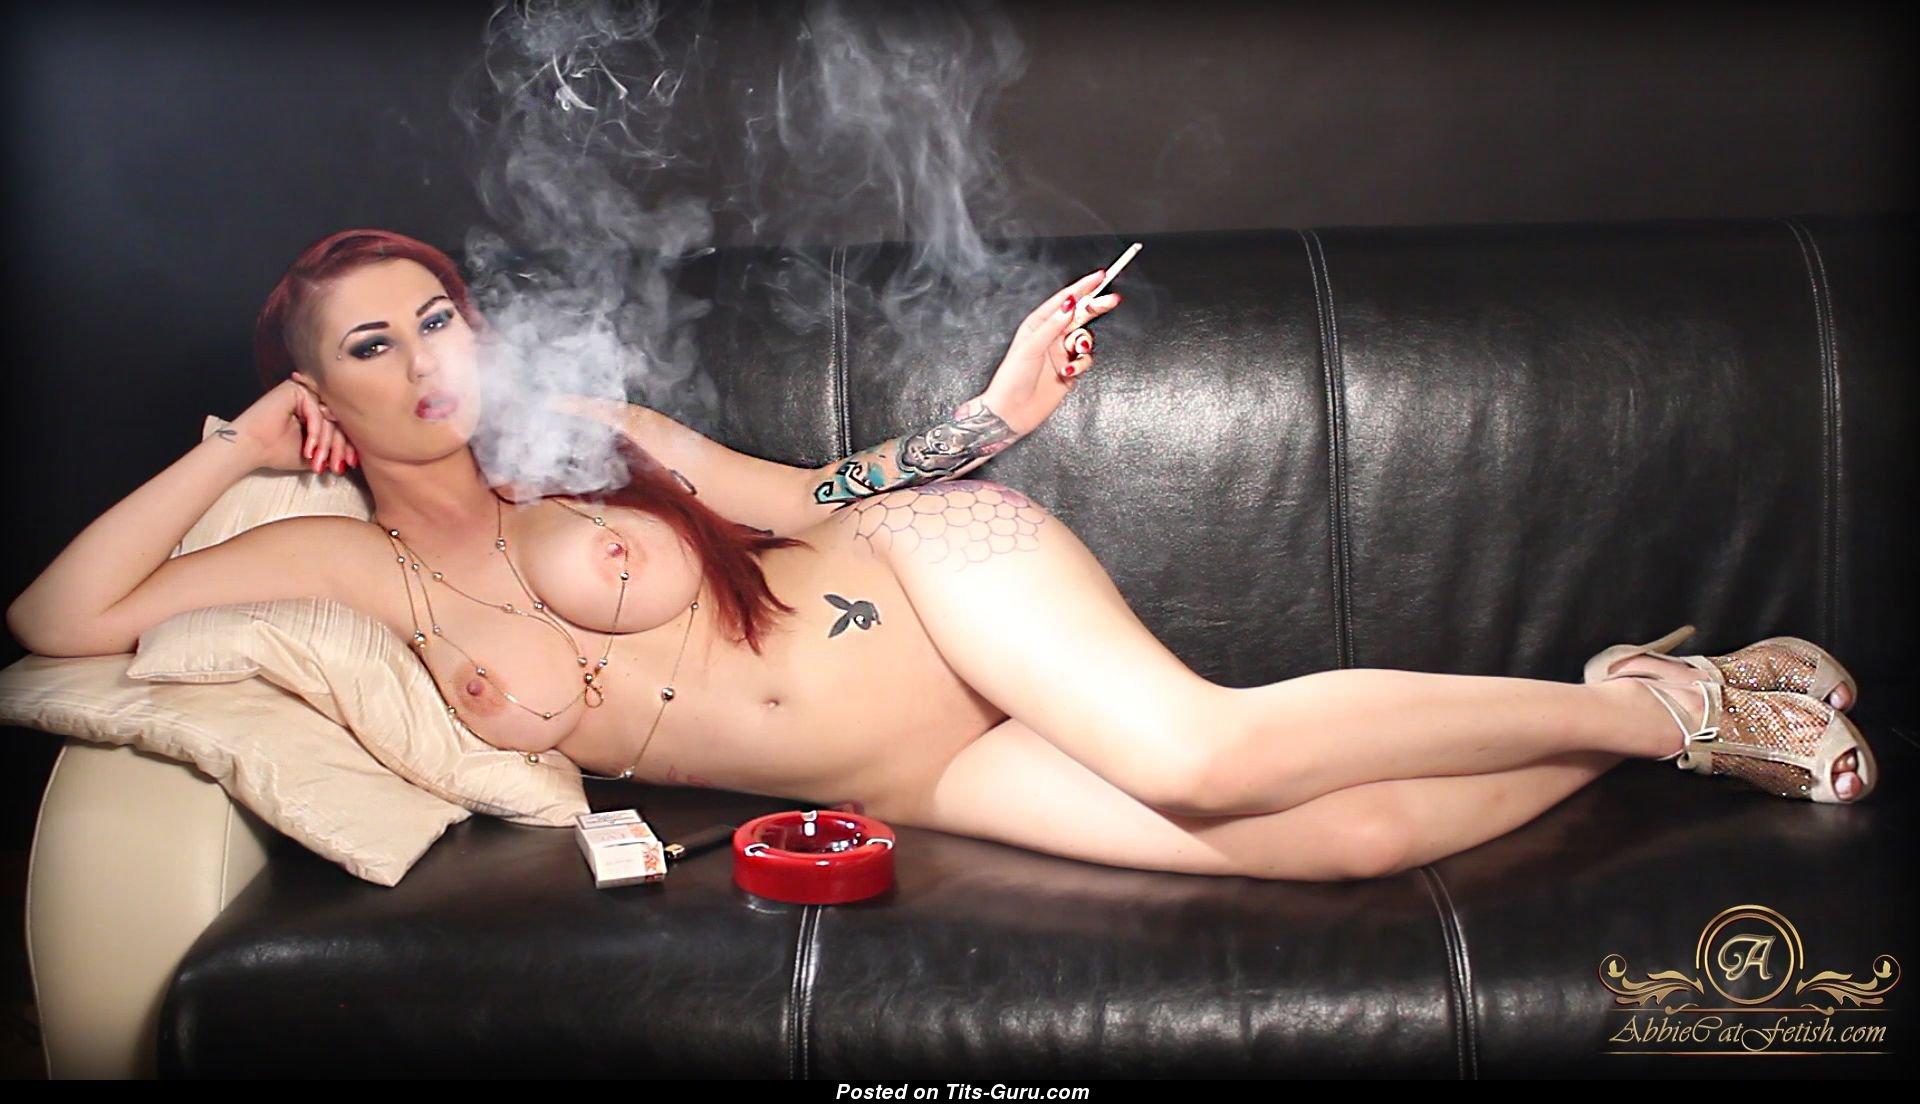 Nude girl smoking weed porn